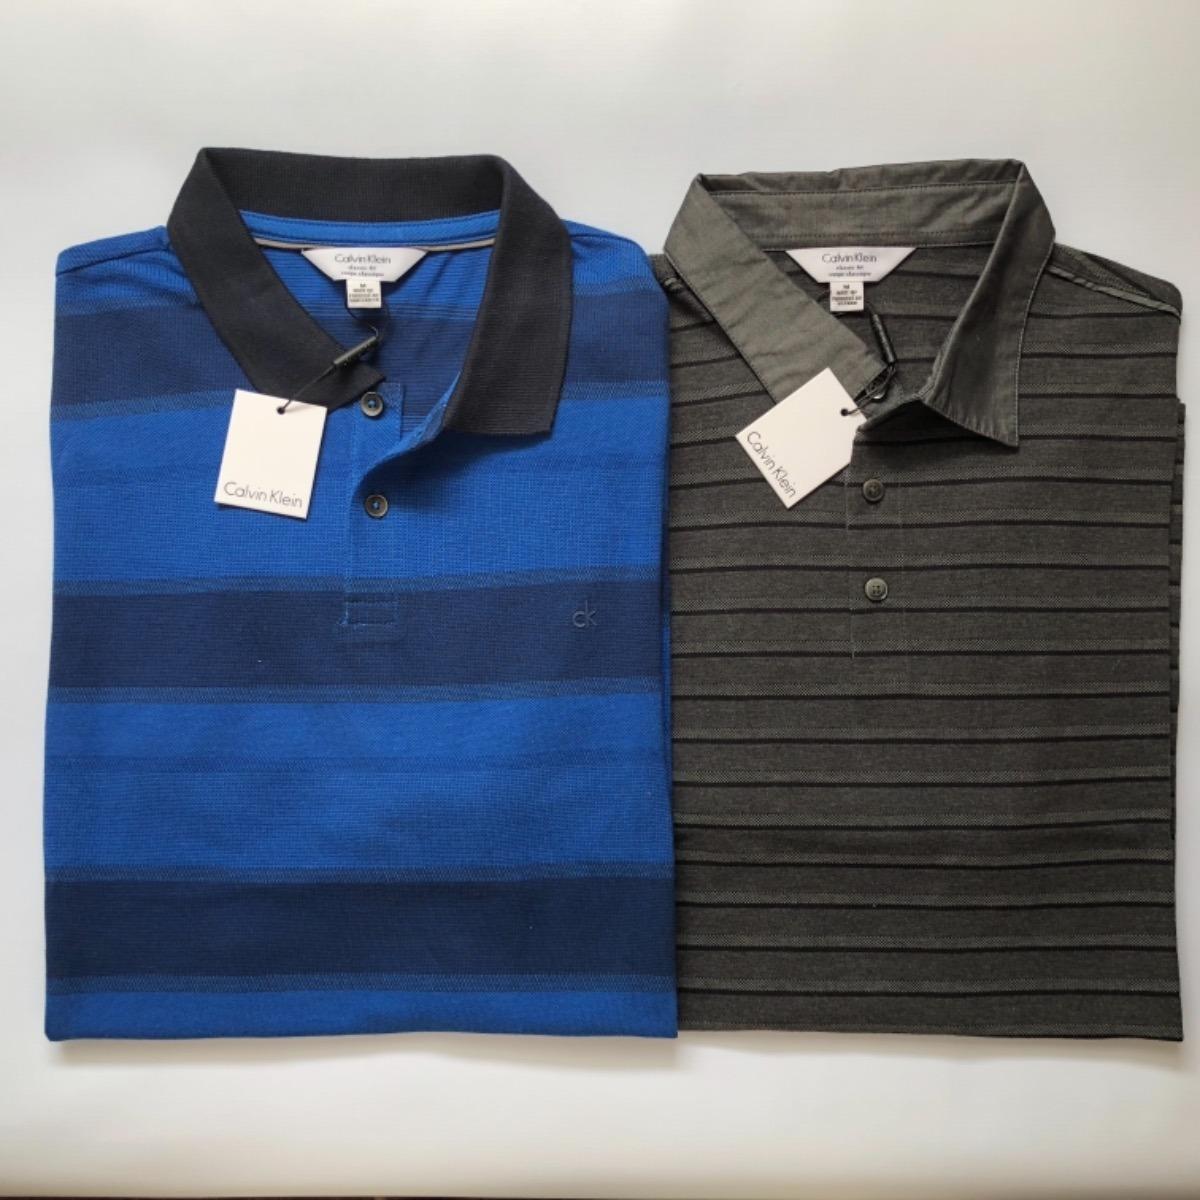 98a3fae7f kit 2 camisa polo masculina calvin klein original importada. Carregando  zoom.